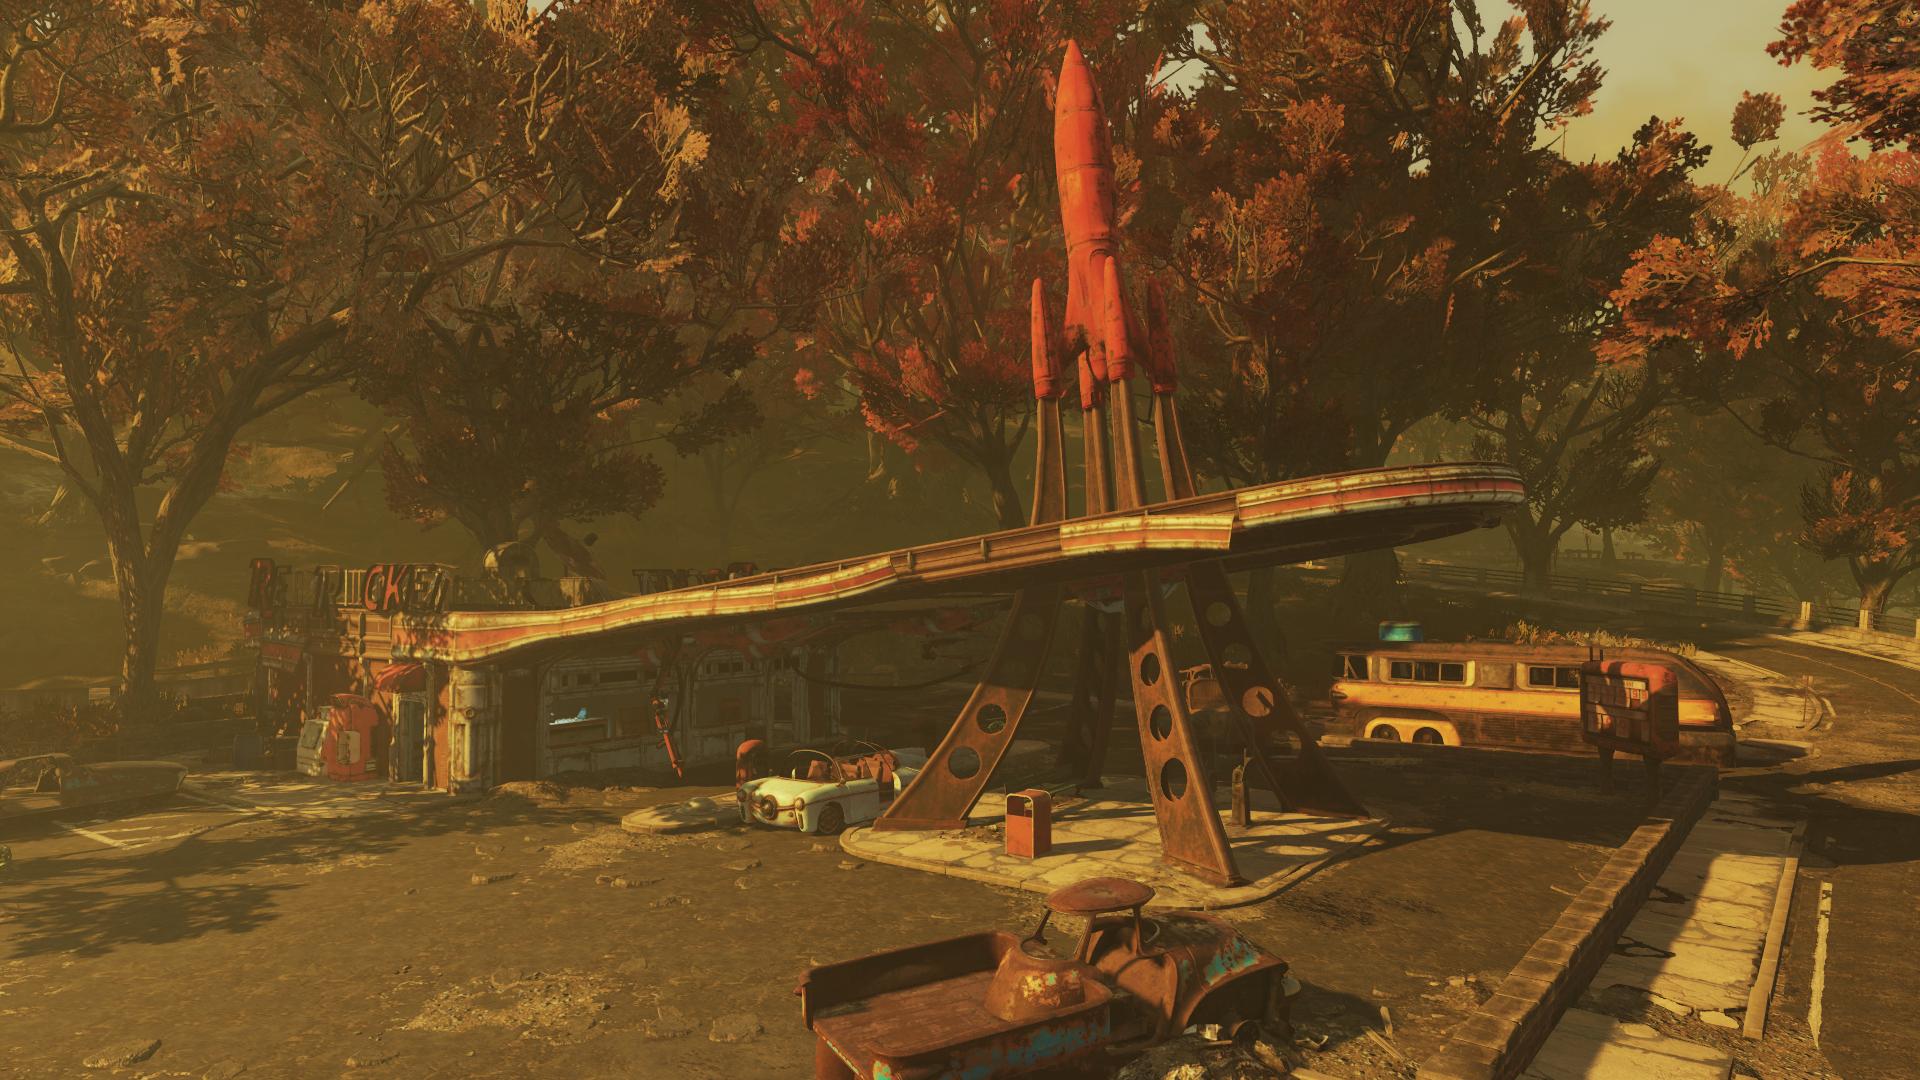 Red Rocket (Valley Galleria)